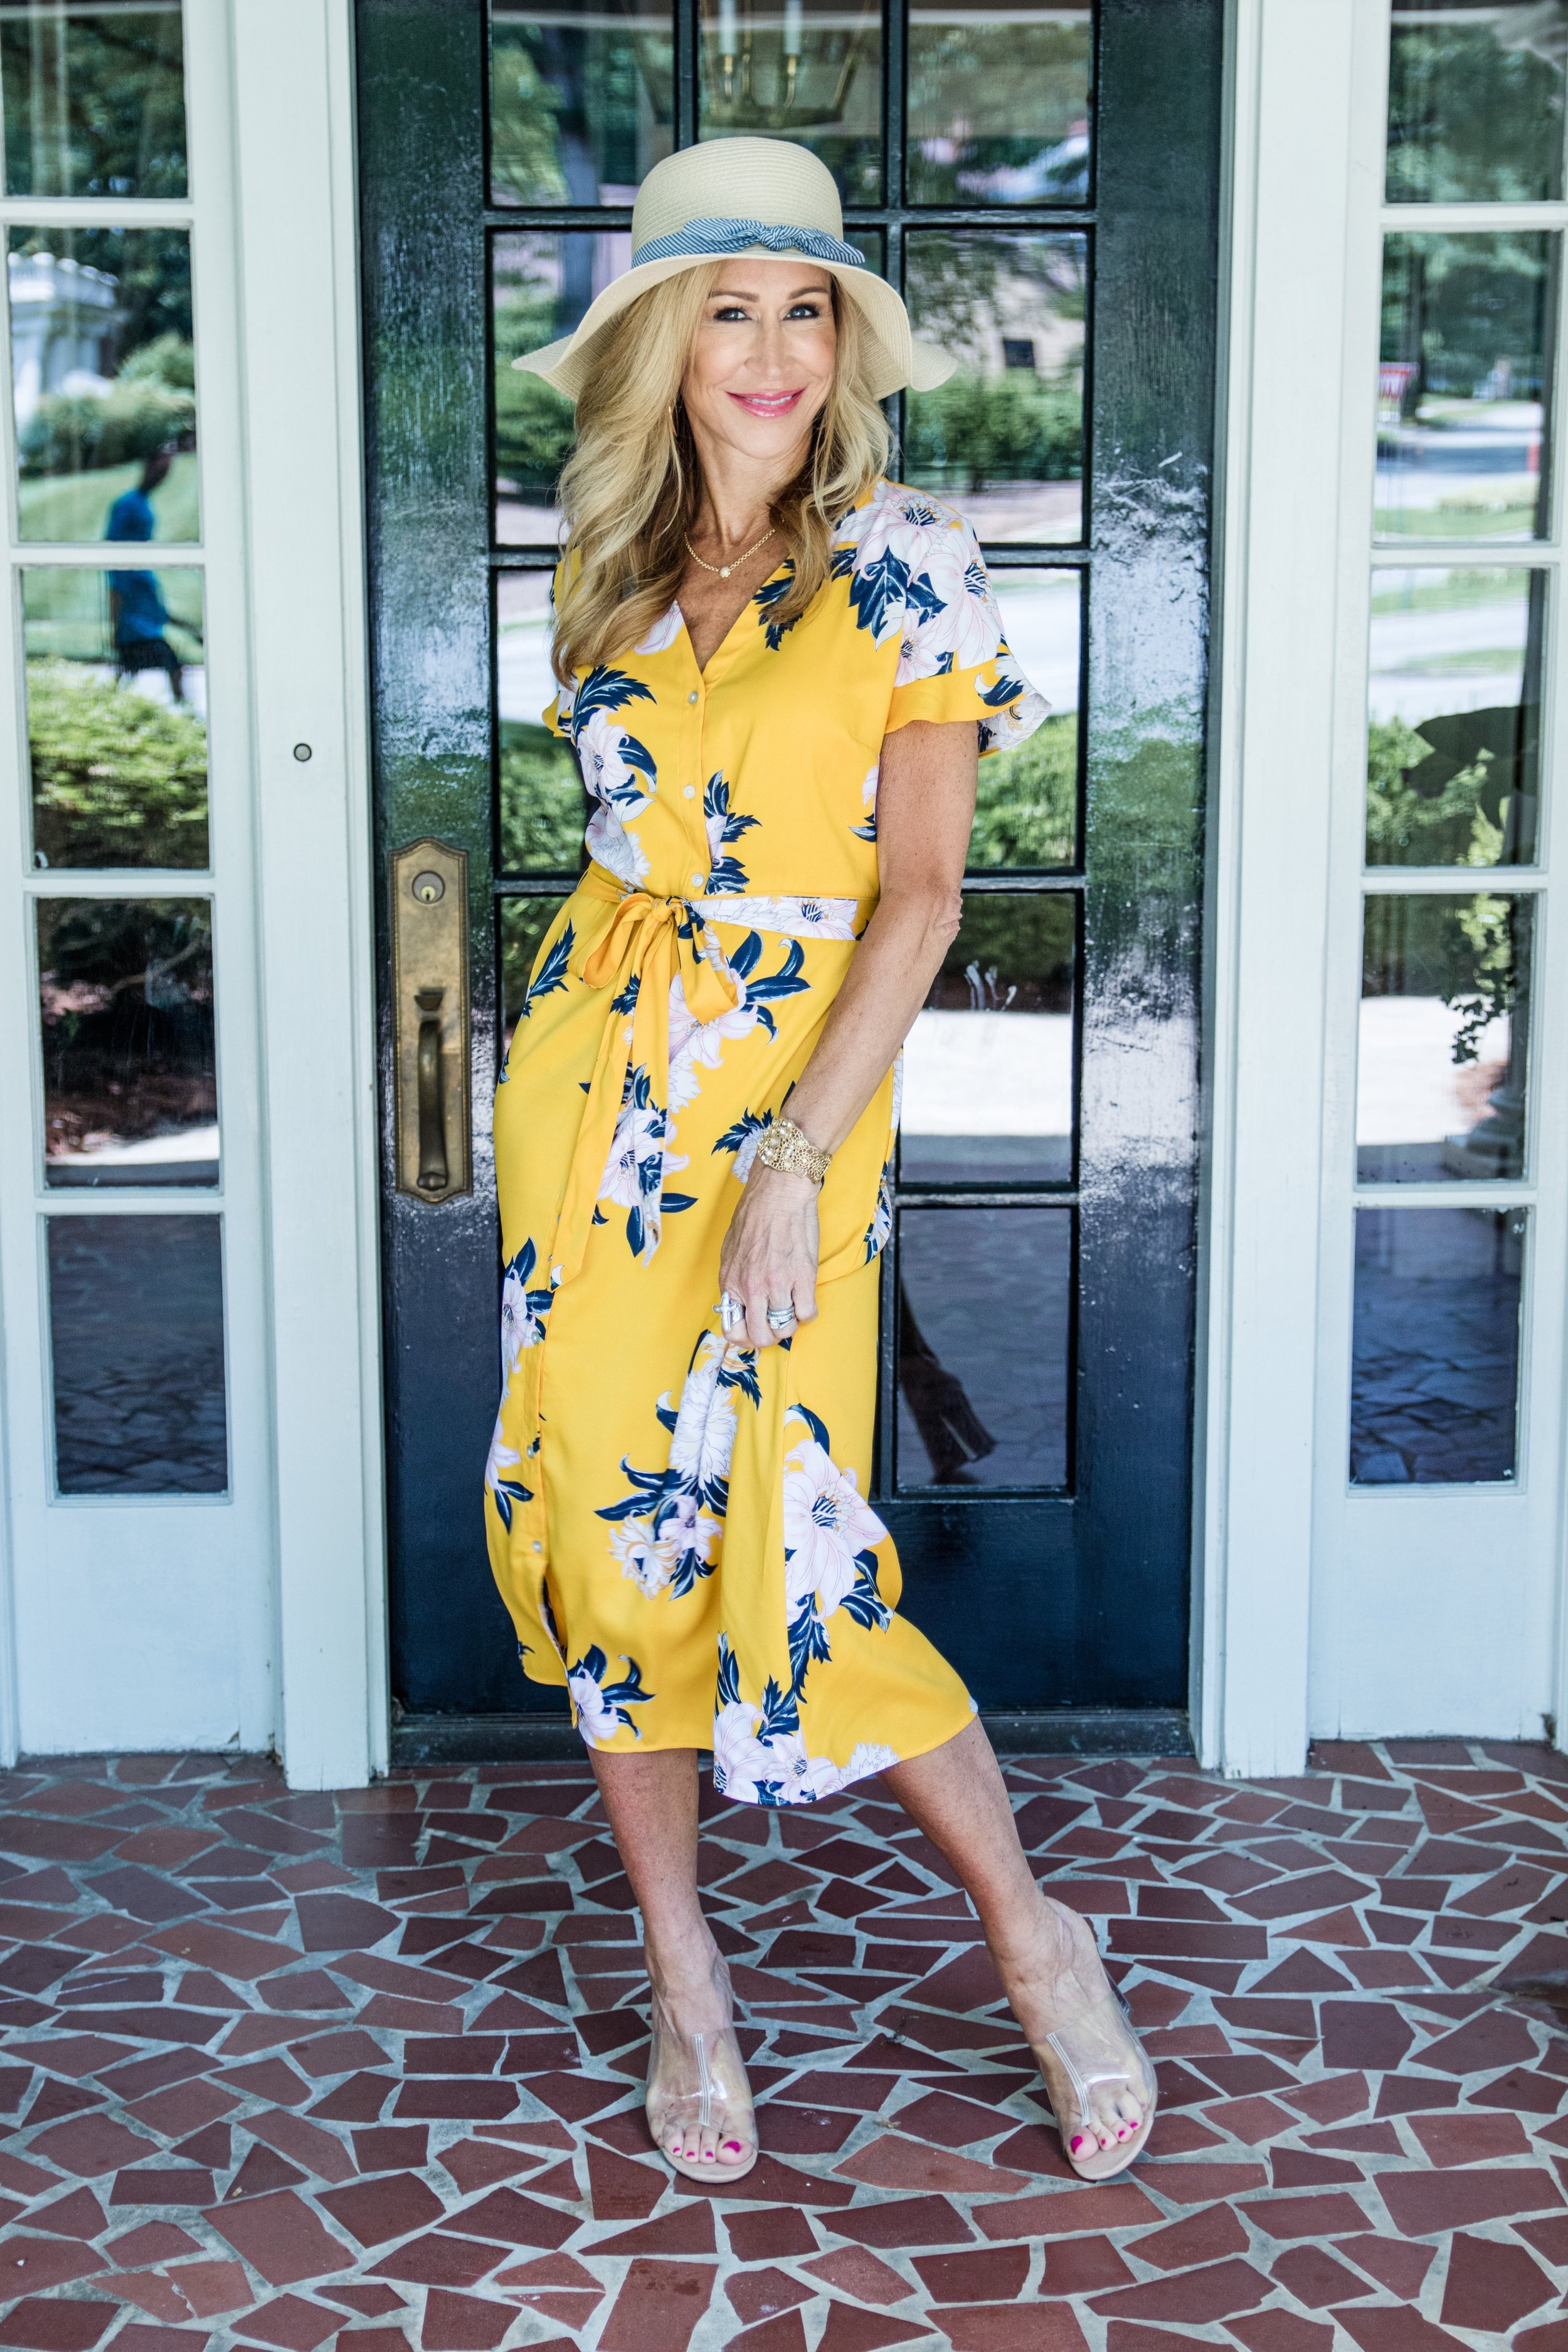 Loft Floral Dress & Hat - Crazy Blonde Life